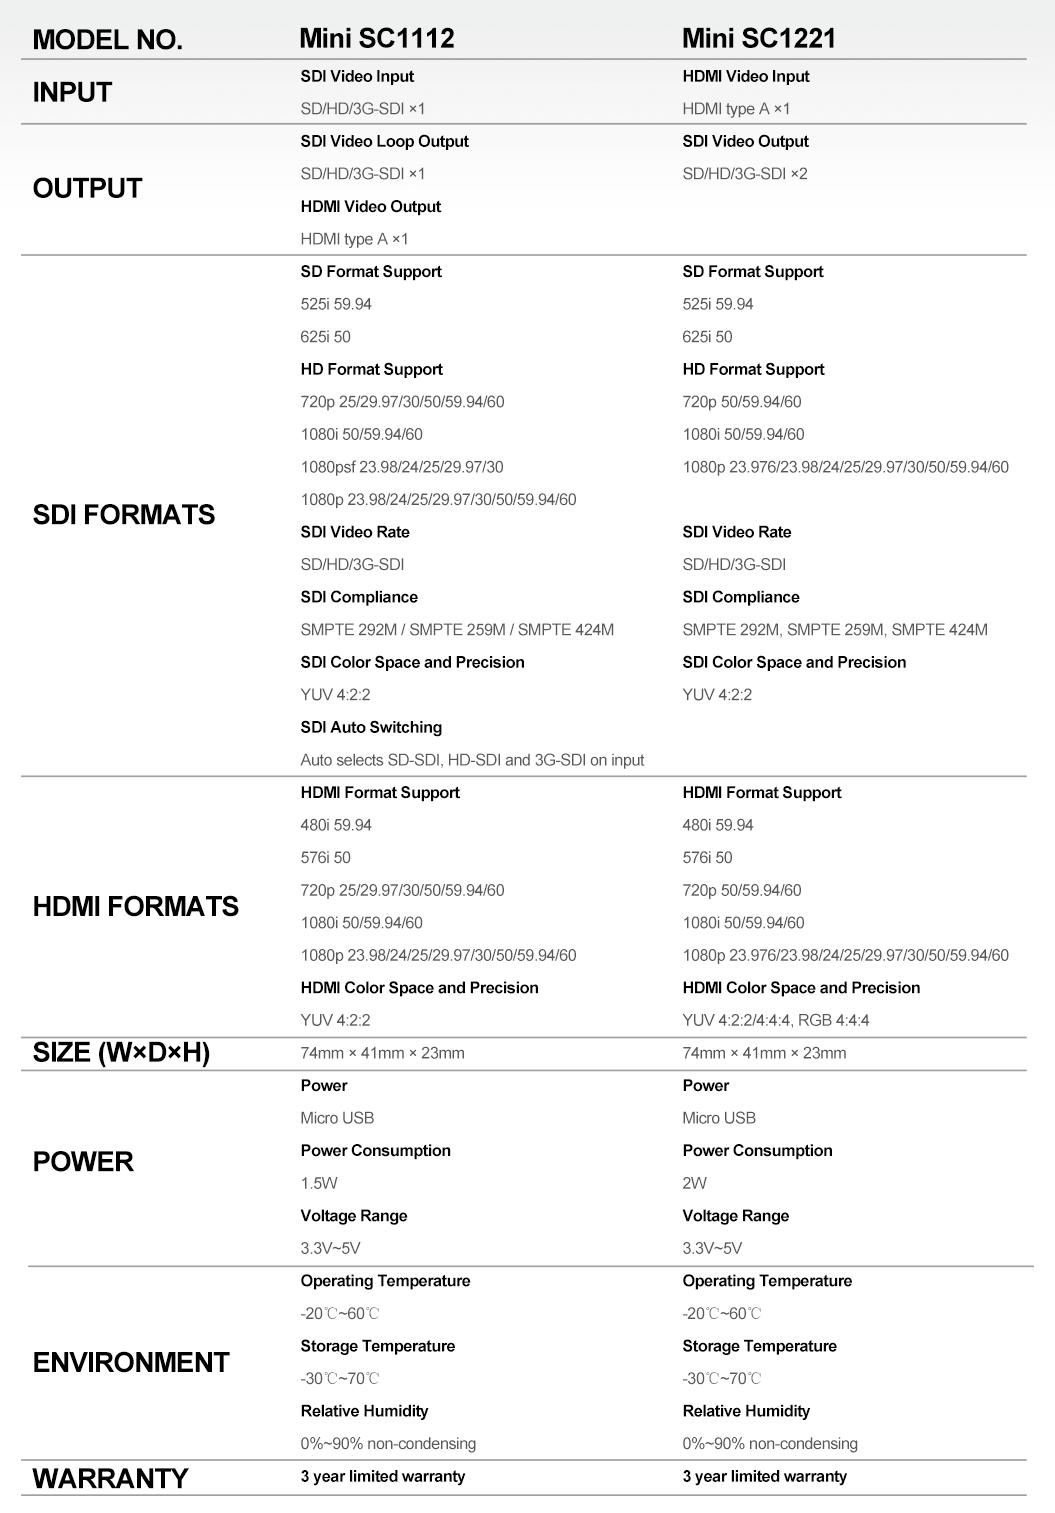 Datasheet AVMATRIX Mini SC1221